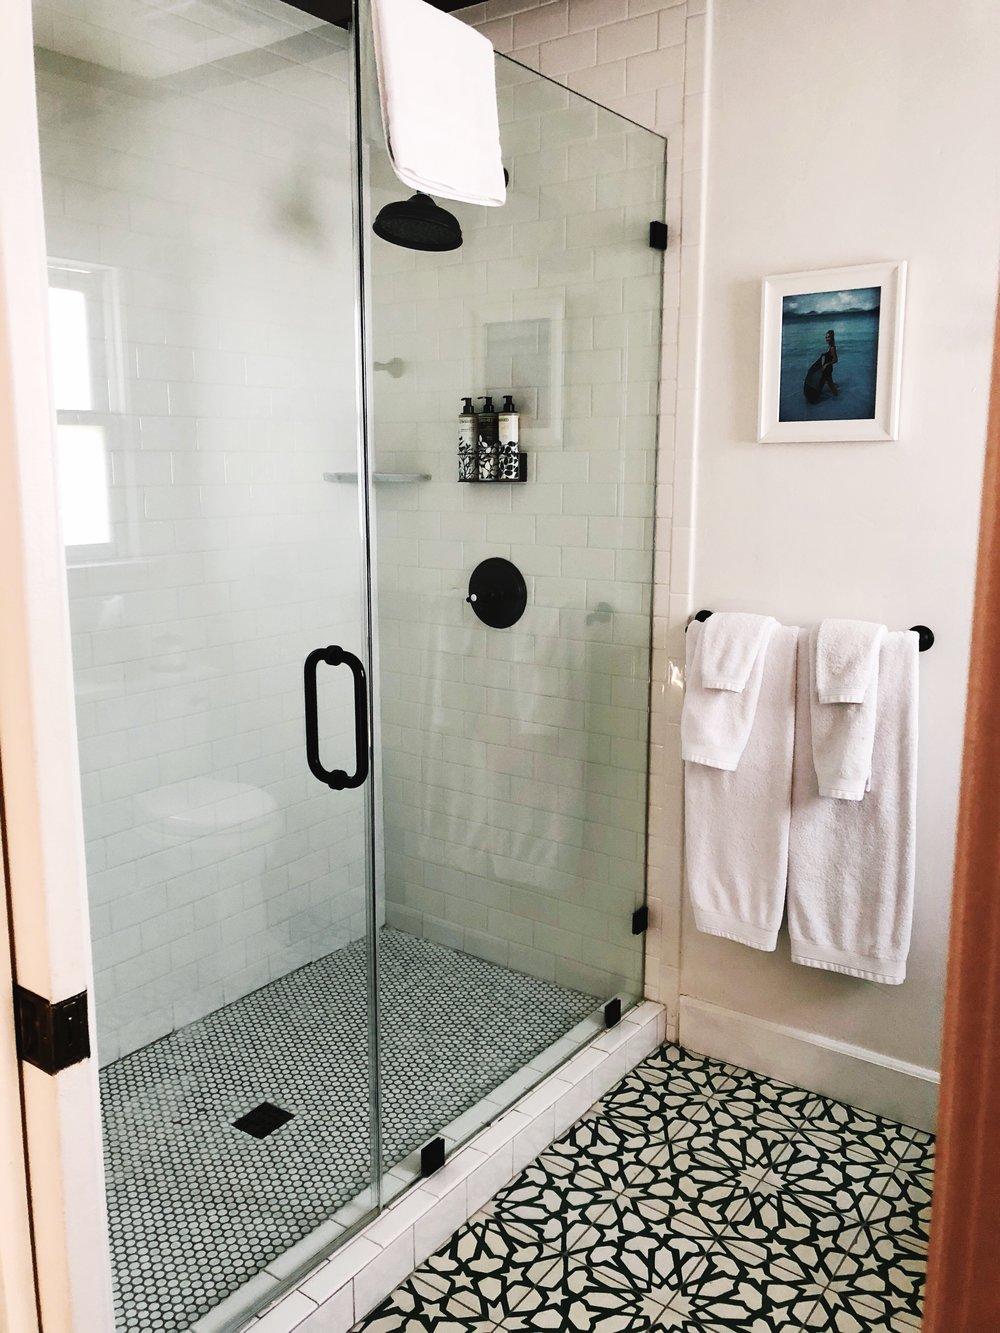 the bathroom's beautiful standing shower